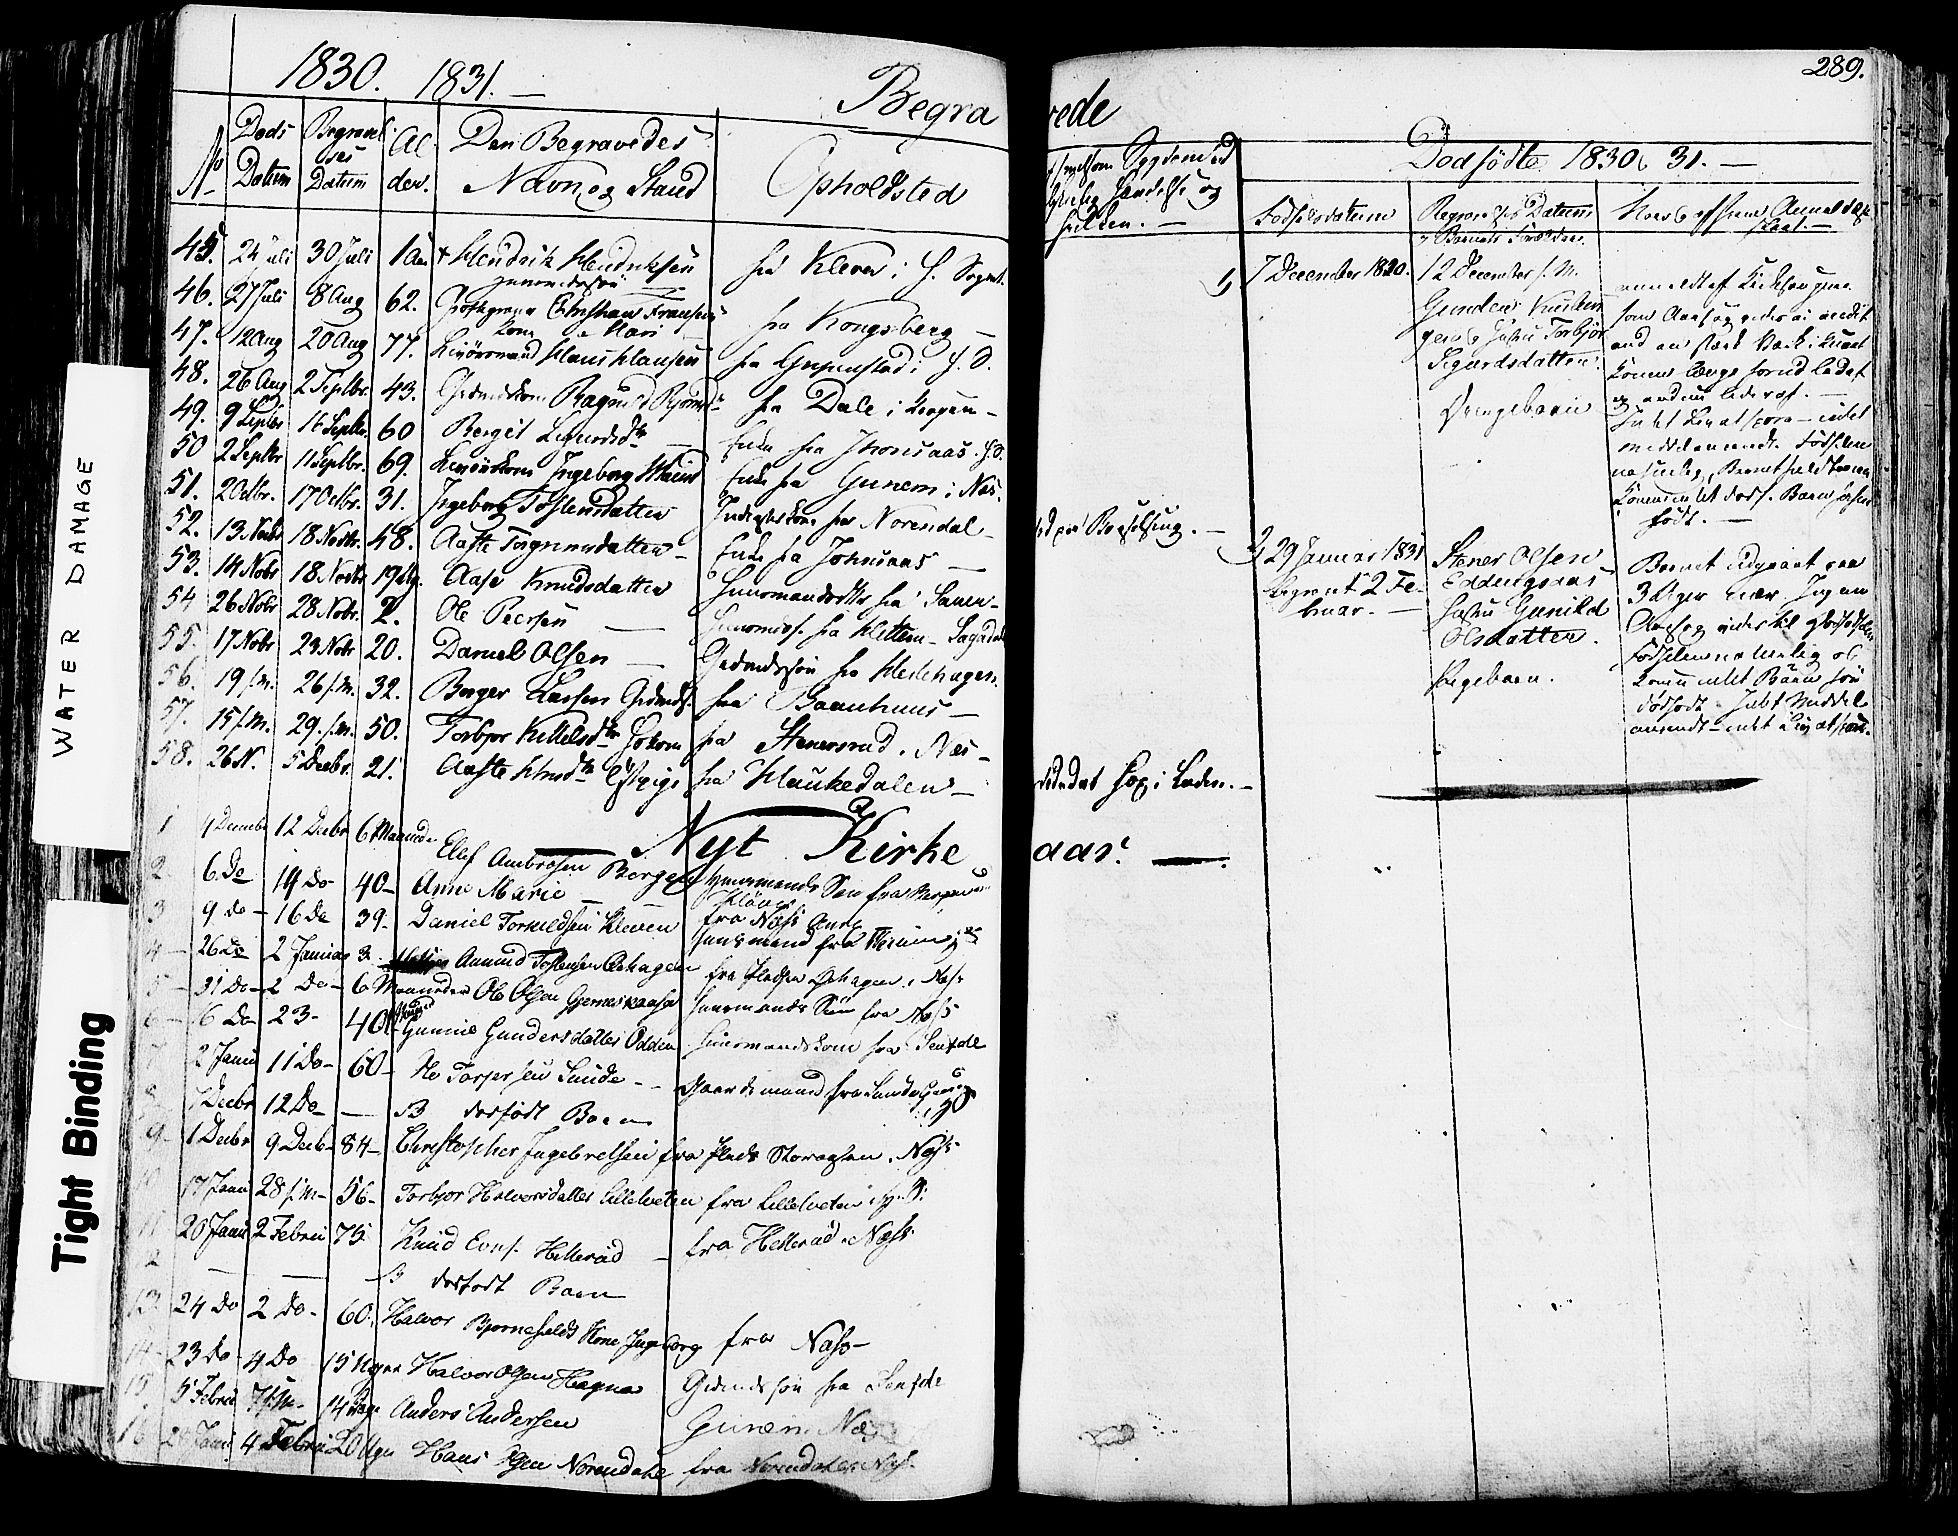 SAKO, Sauherad kirkebøker, F/Fa/L0006: Ministerialbok nr. I 6, 1827-1850, s. 289